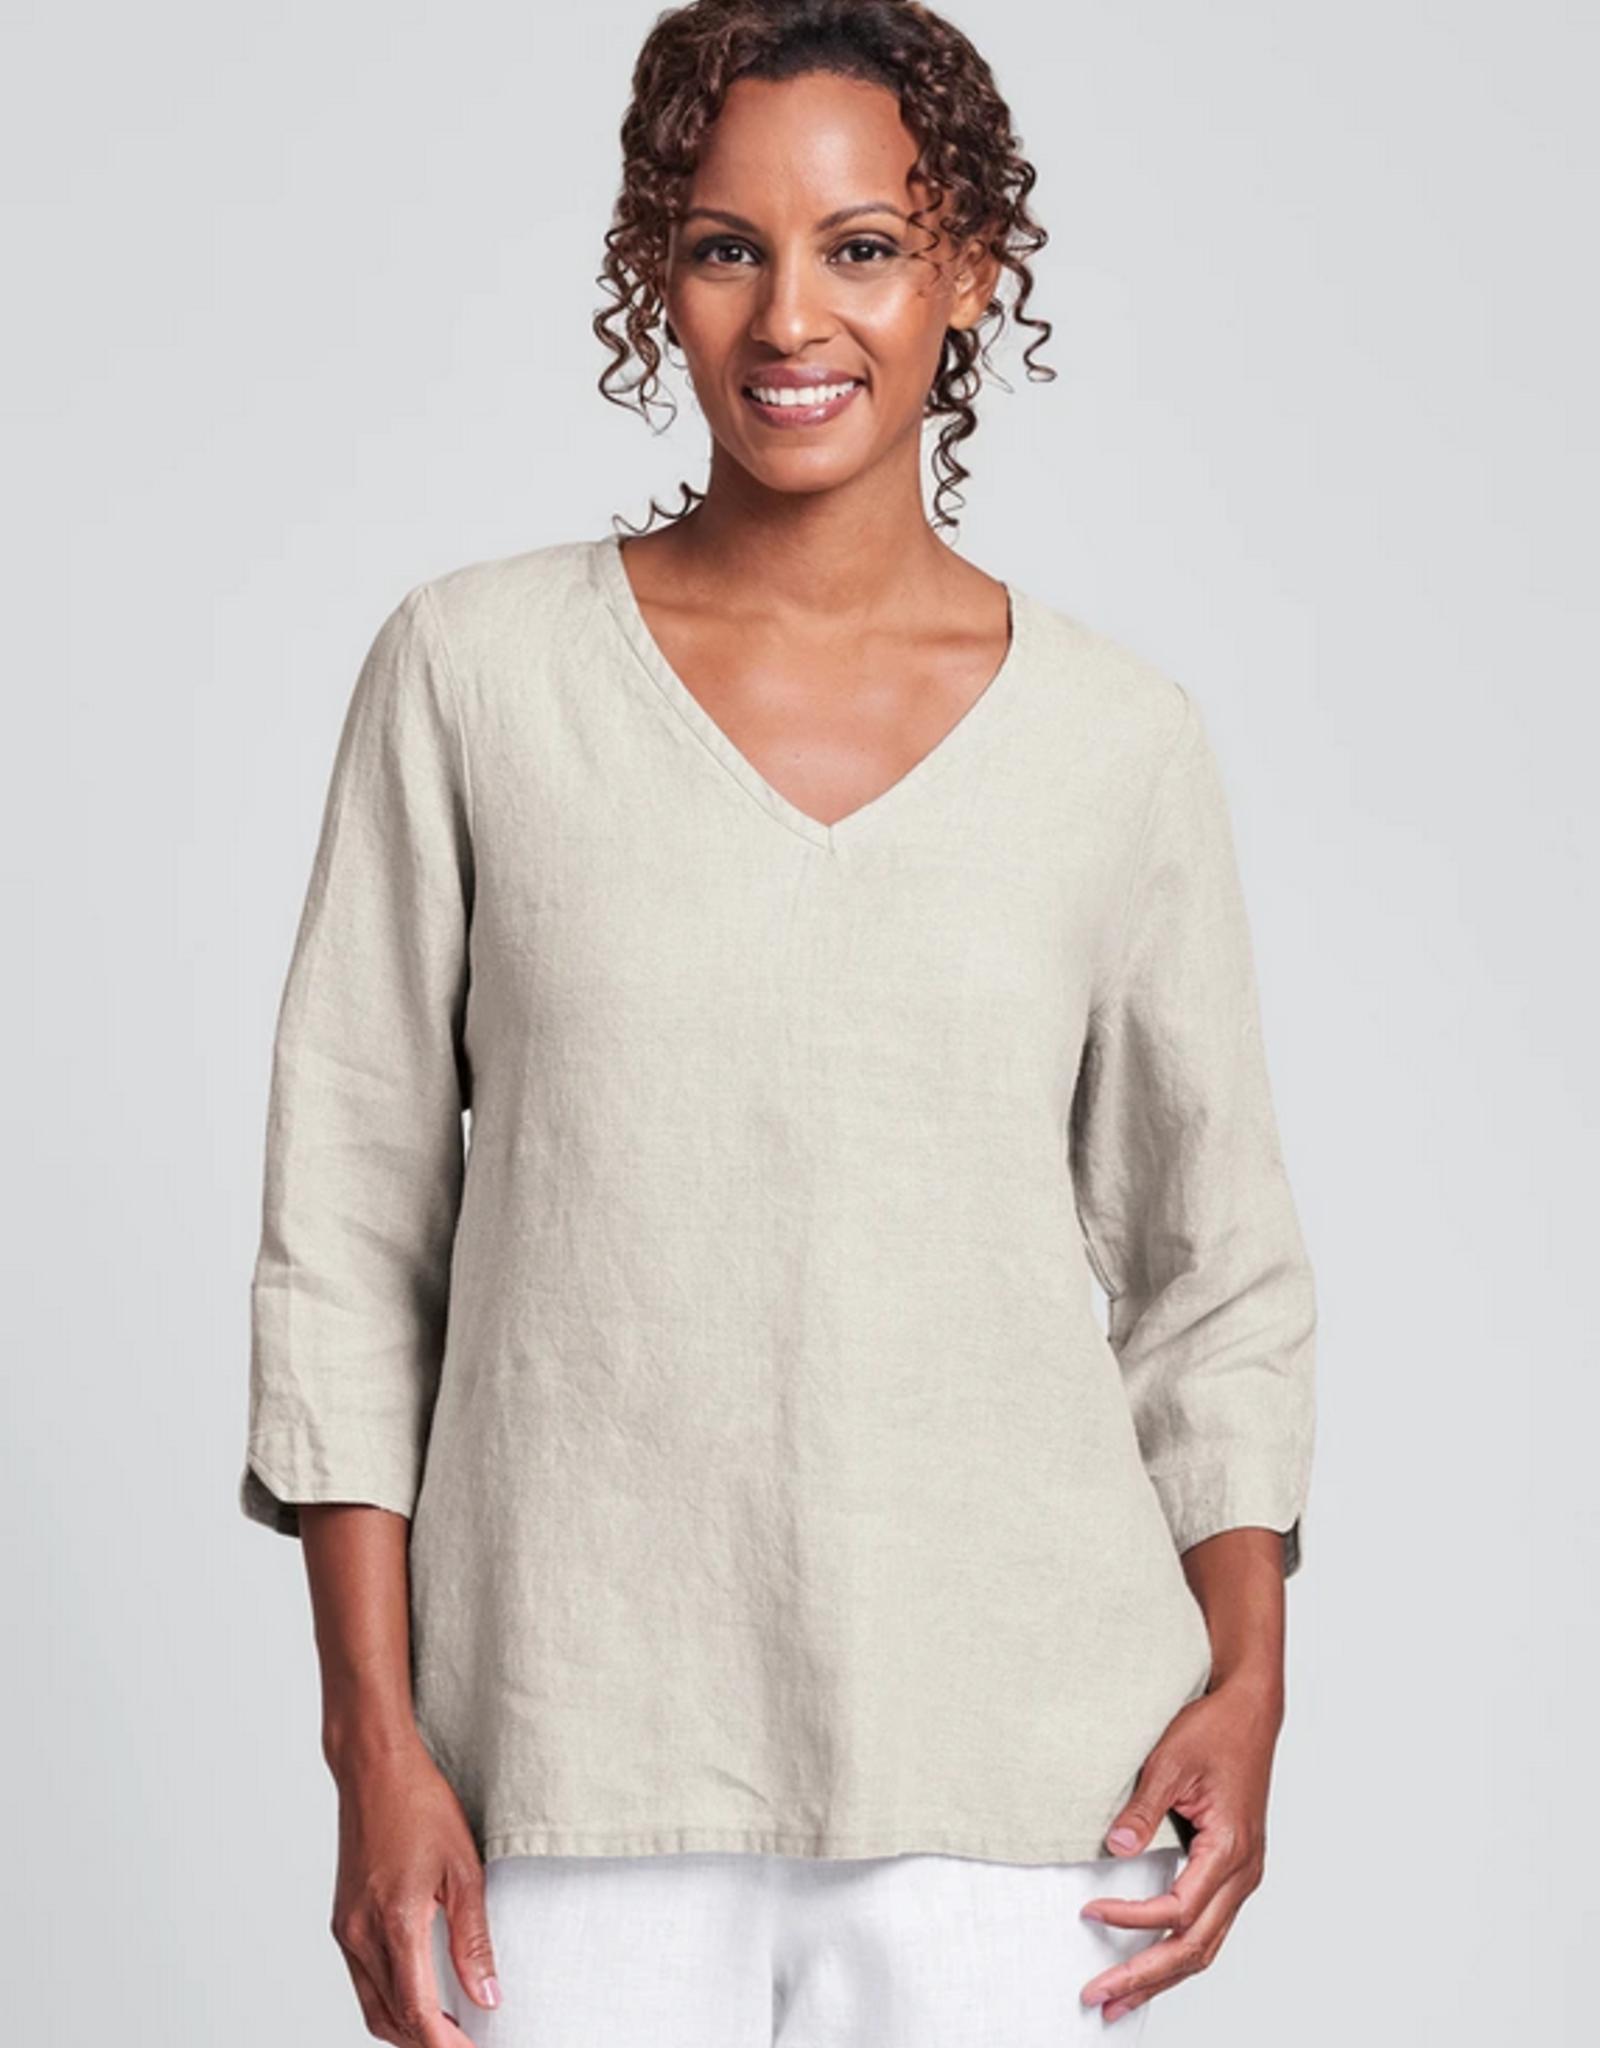 Flax Flax Linen V Pullover 5 Colors